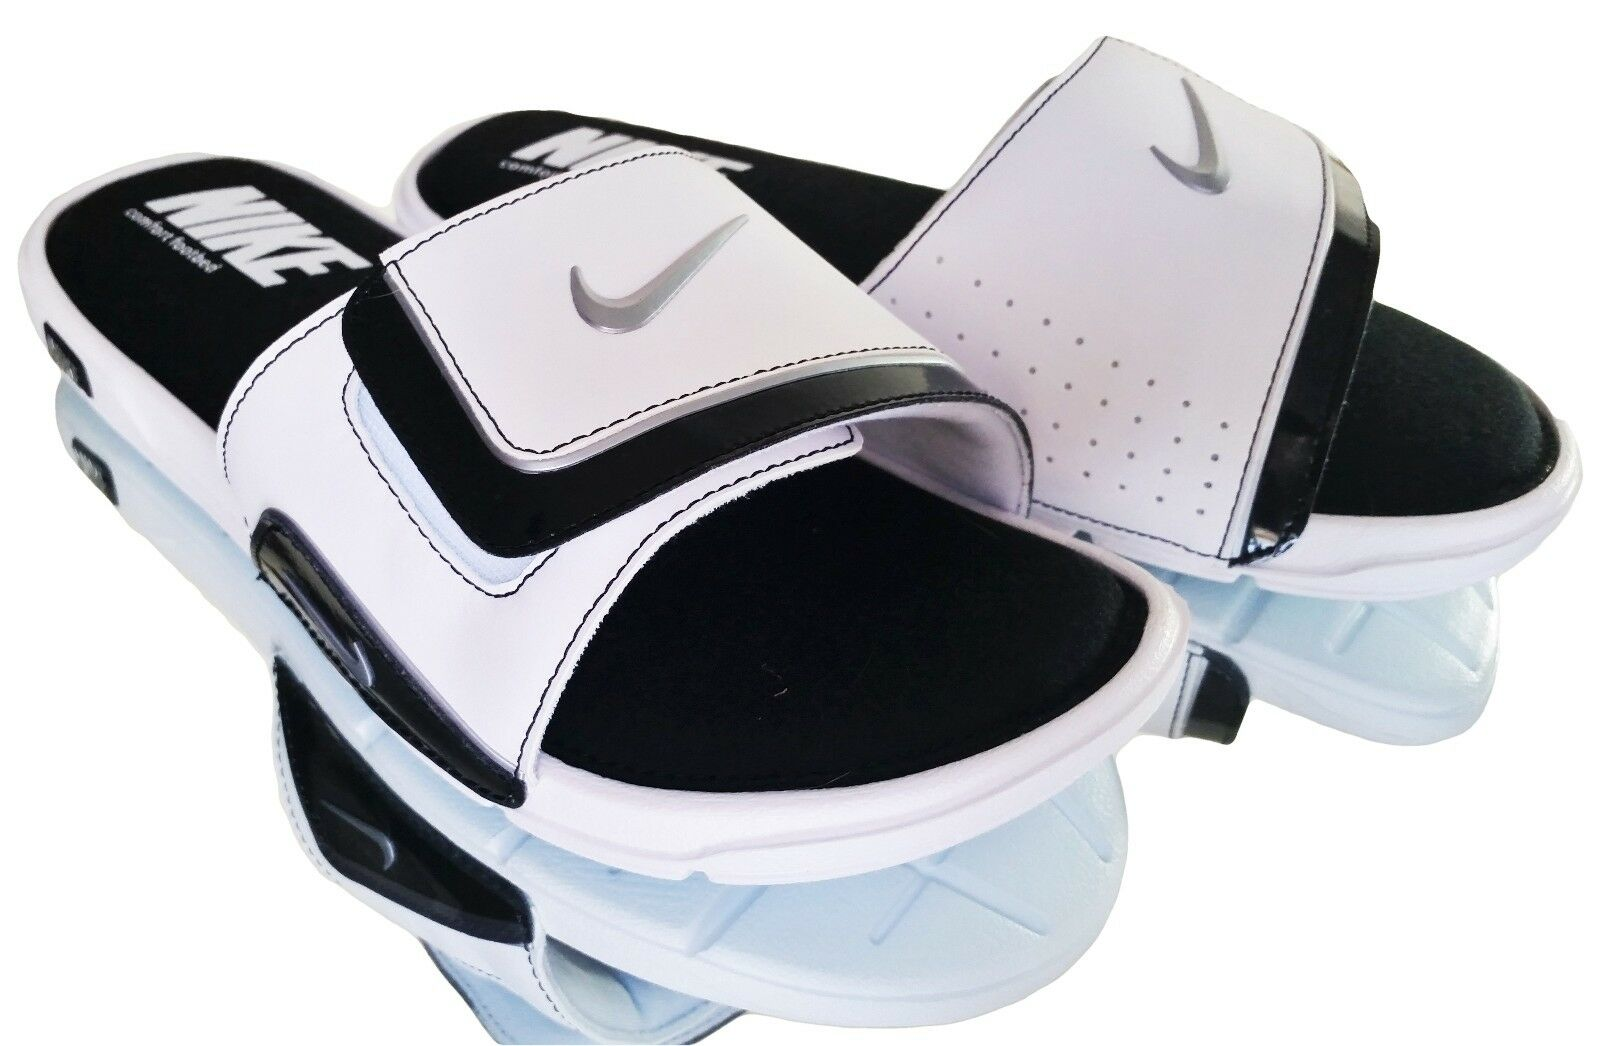 a1da8ec50434 Nike Comfort Slide 2 Sandals 415205-100 White Silver Black Mens US ...